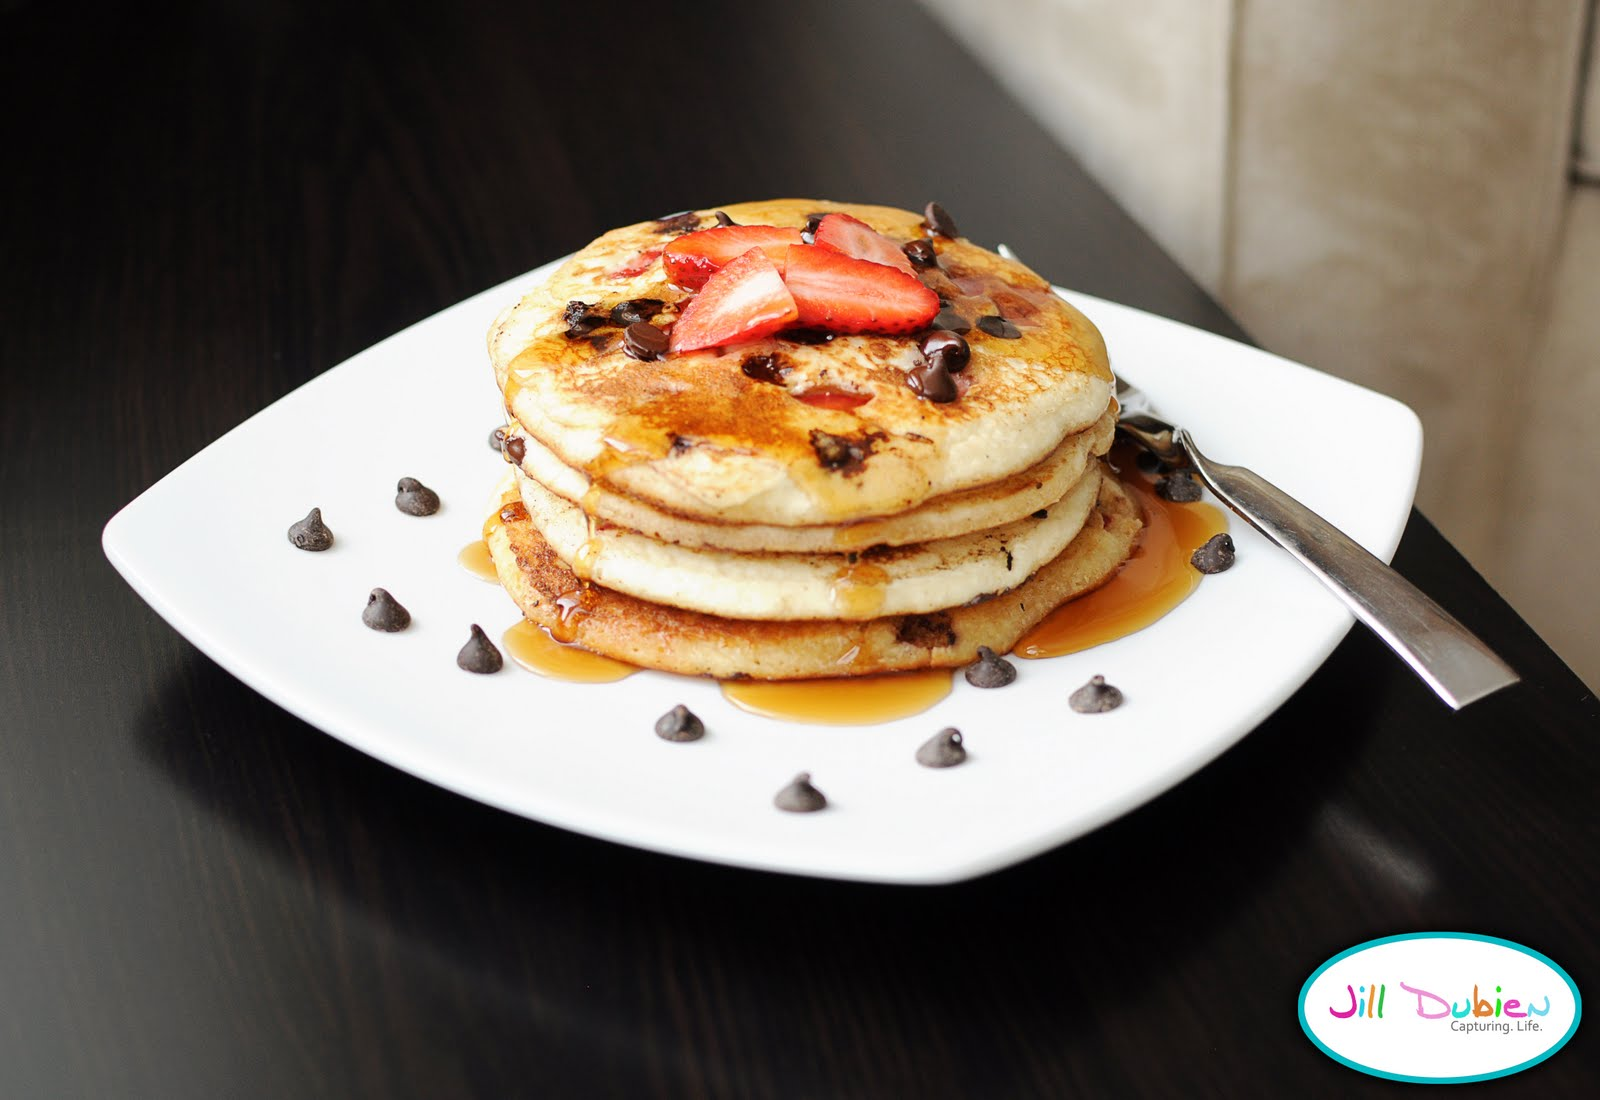 neapolitan pancakes | Meet the Dubiens